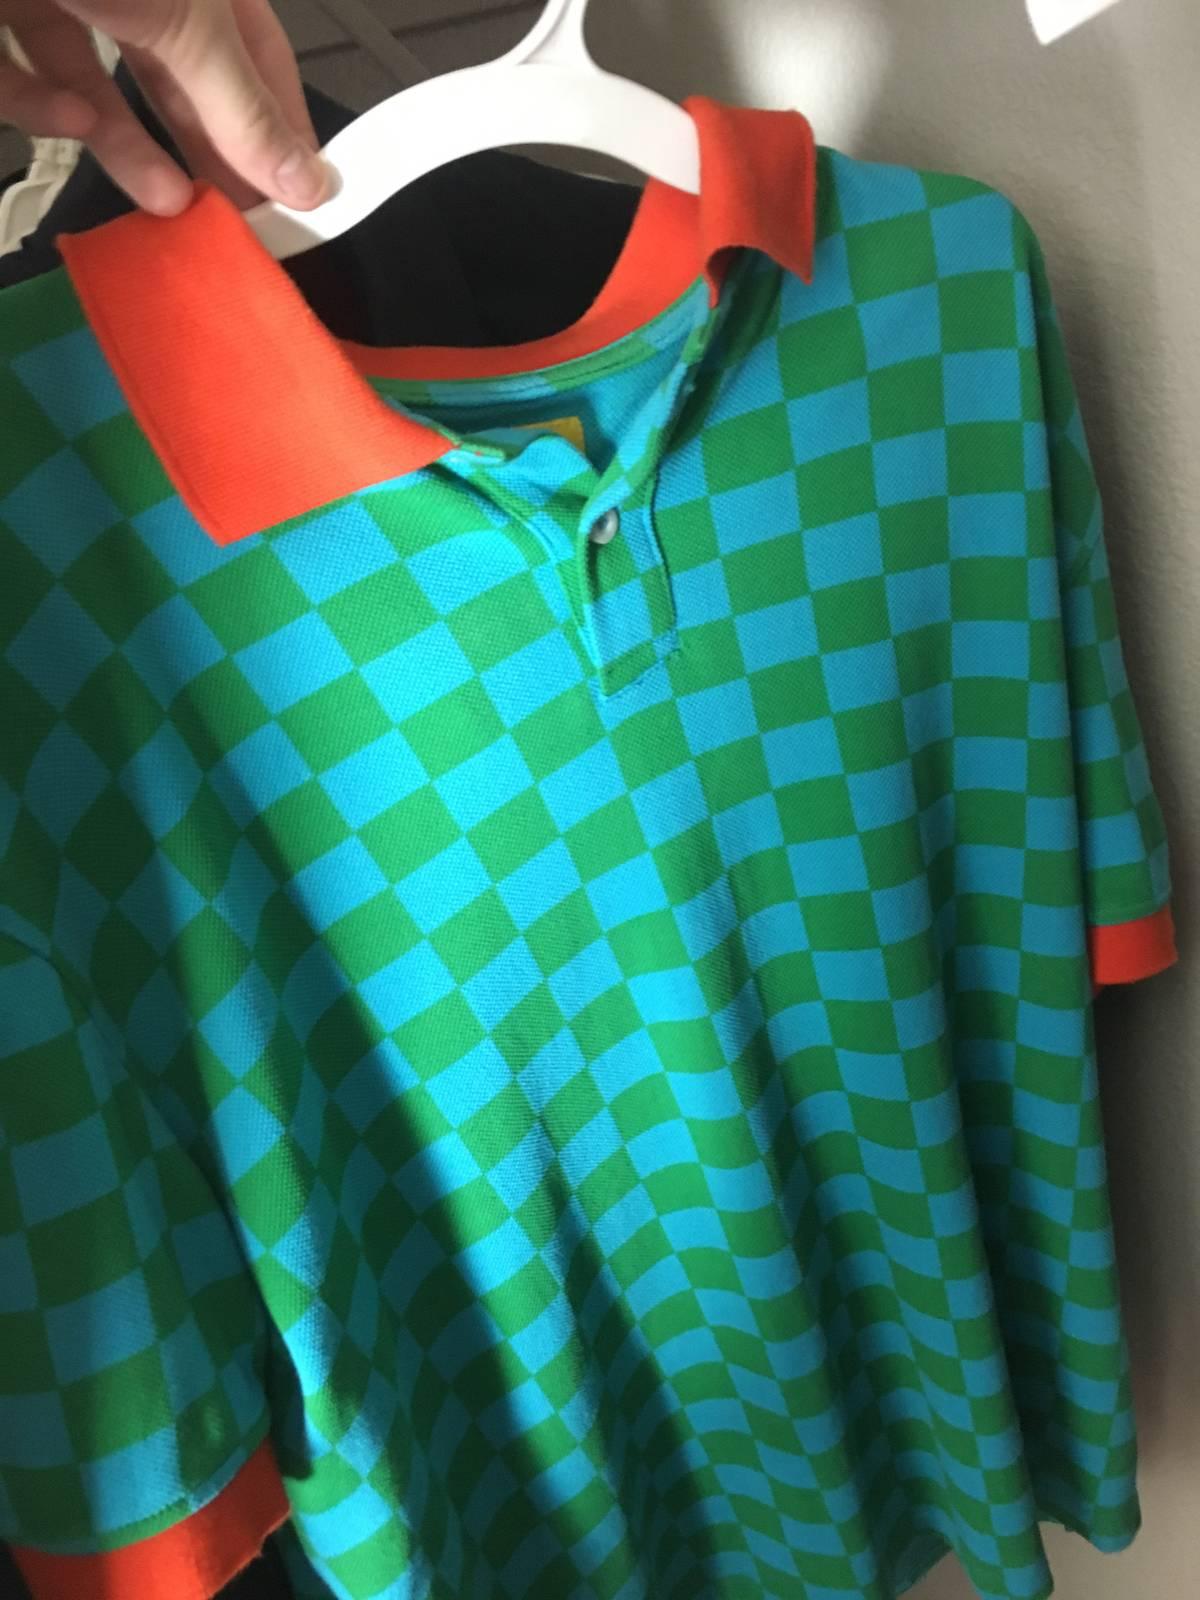 d7a0ad1e9b3f21 Golf Wang Golf Wang Checkered Polo Size M Polos For Sale Grailed